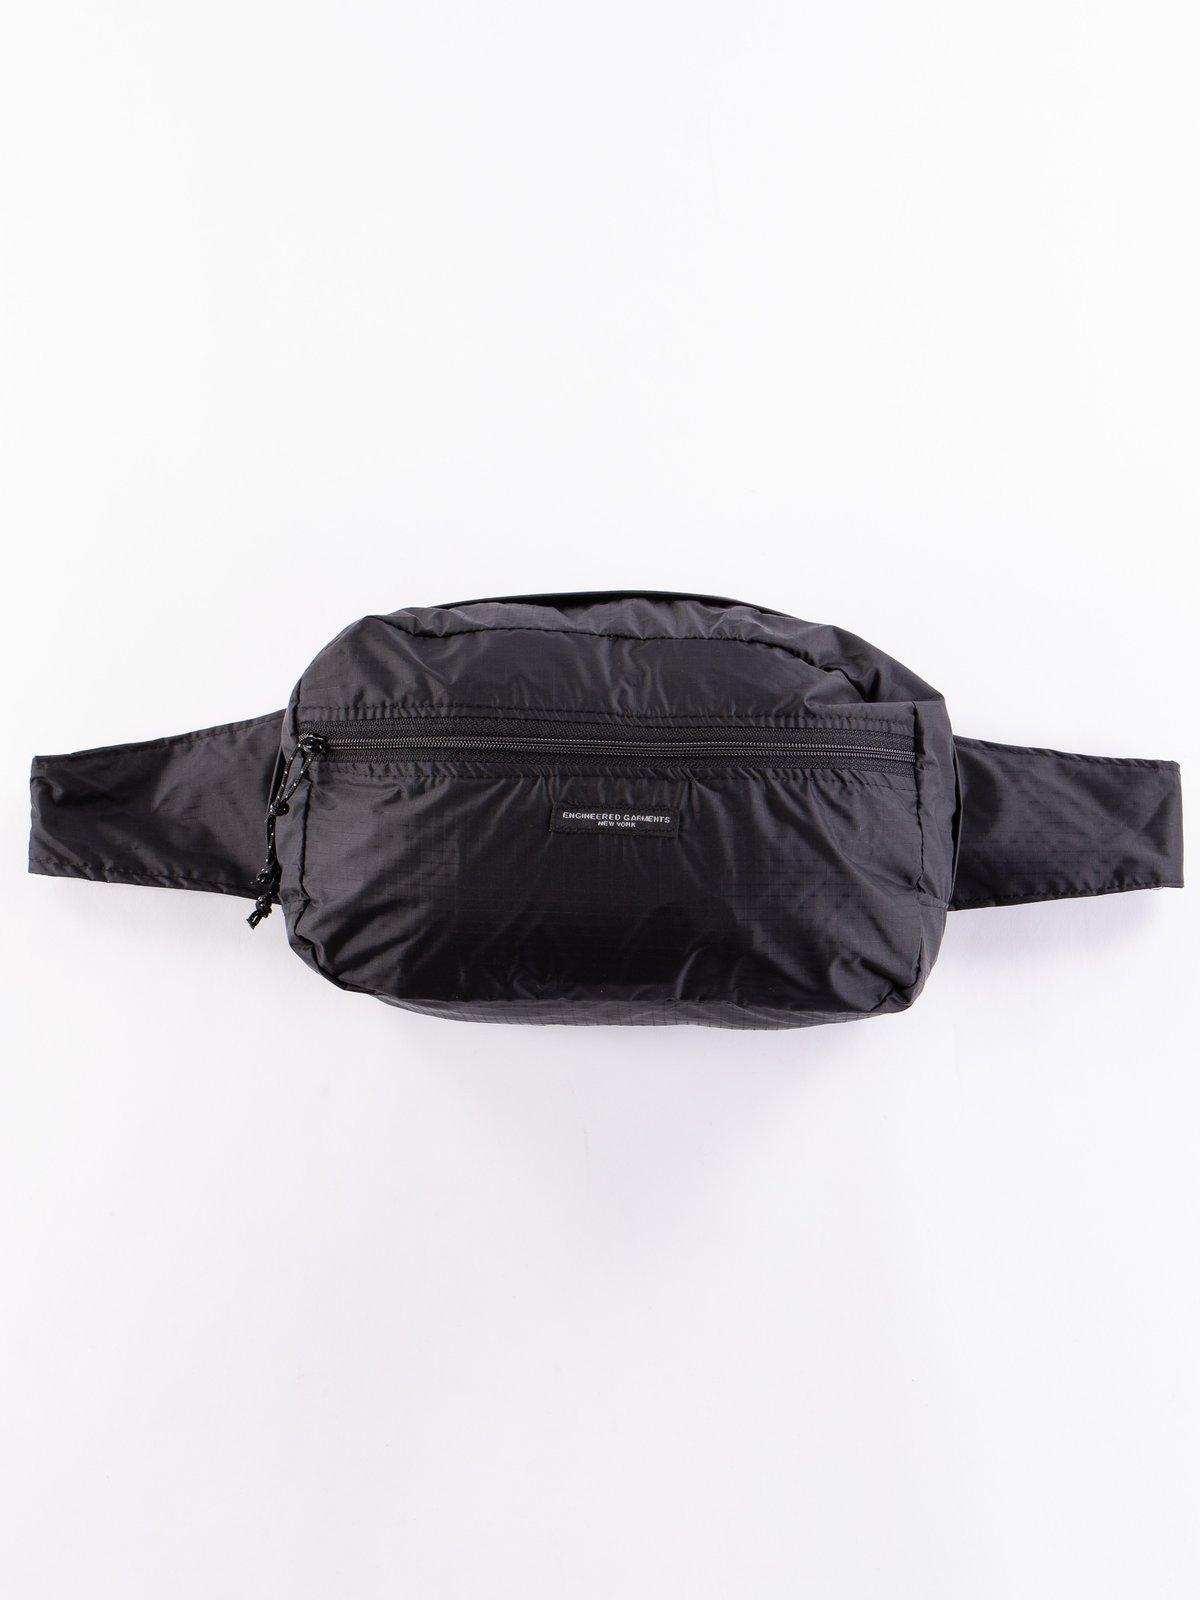 Black Nylon Ripstop UL Waistpack - Image 1